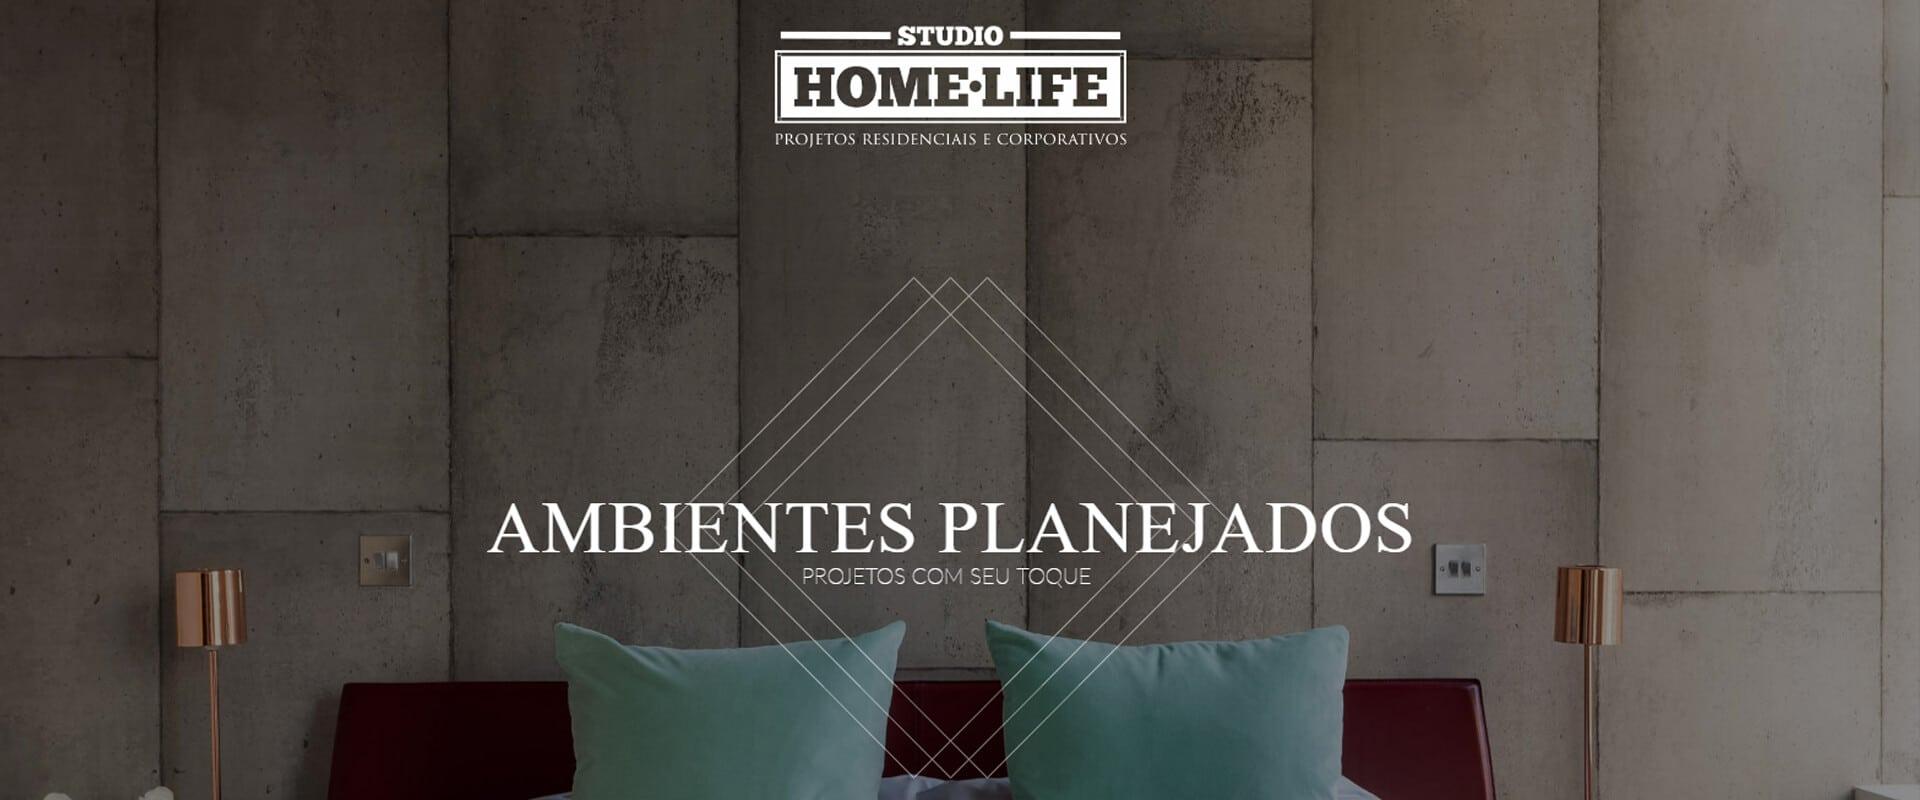 home life Banner